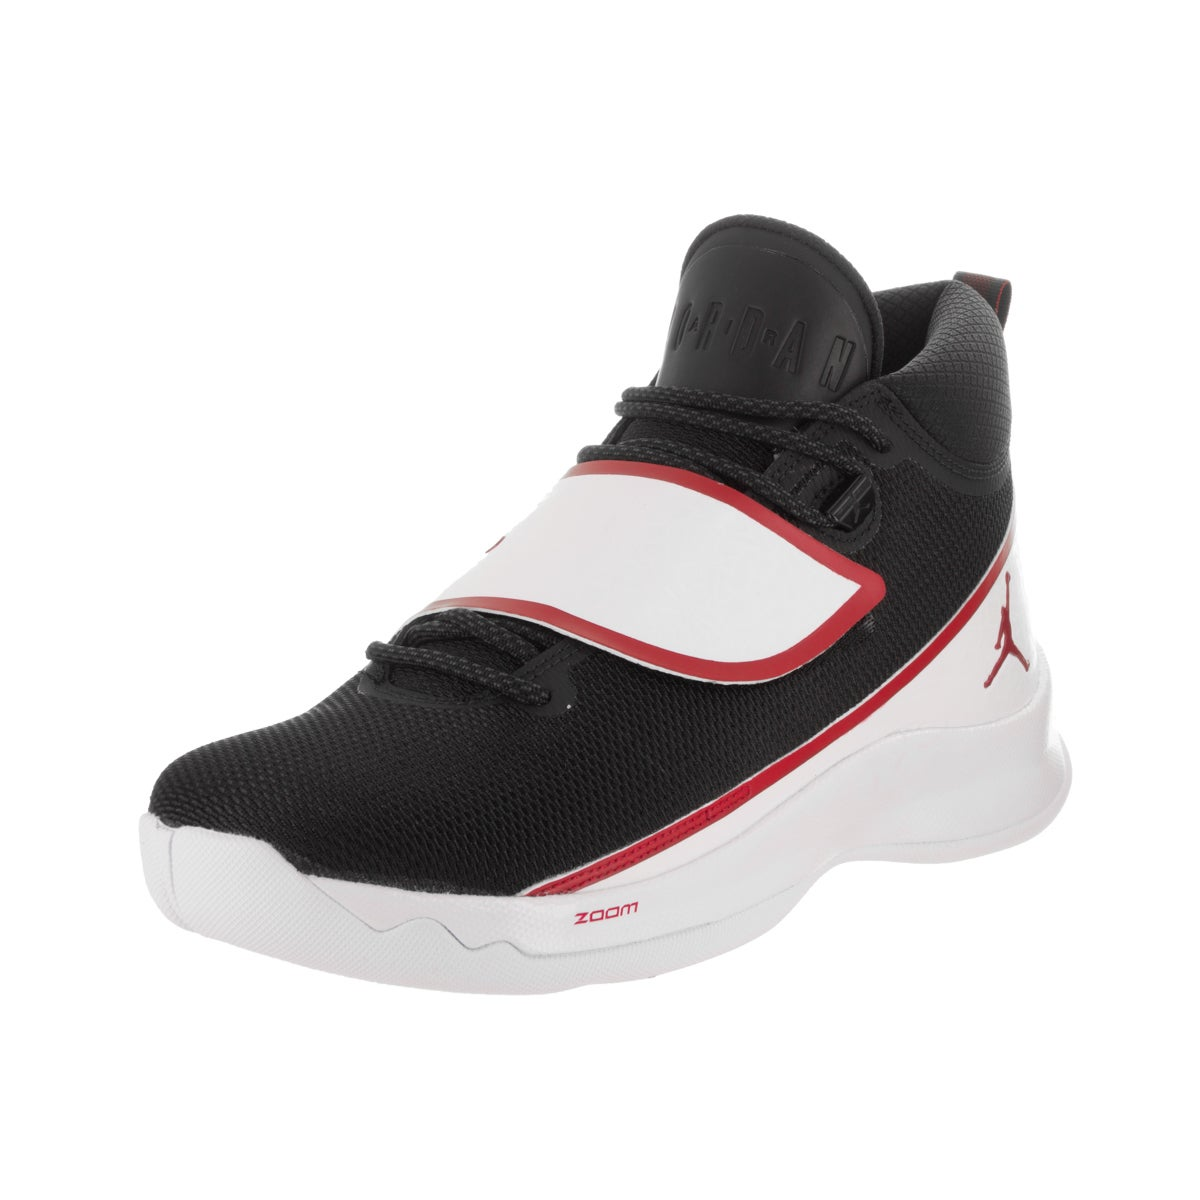 ad42eb7d5dc95 Details about Nike Jordan Men s Jordan Super.Fly 5 PO Black Basketball Shoe